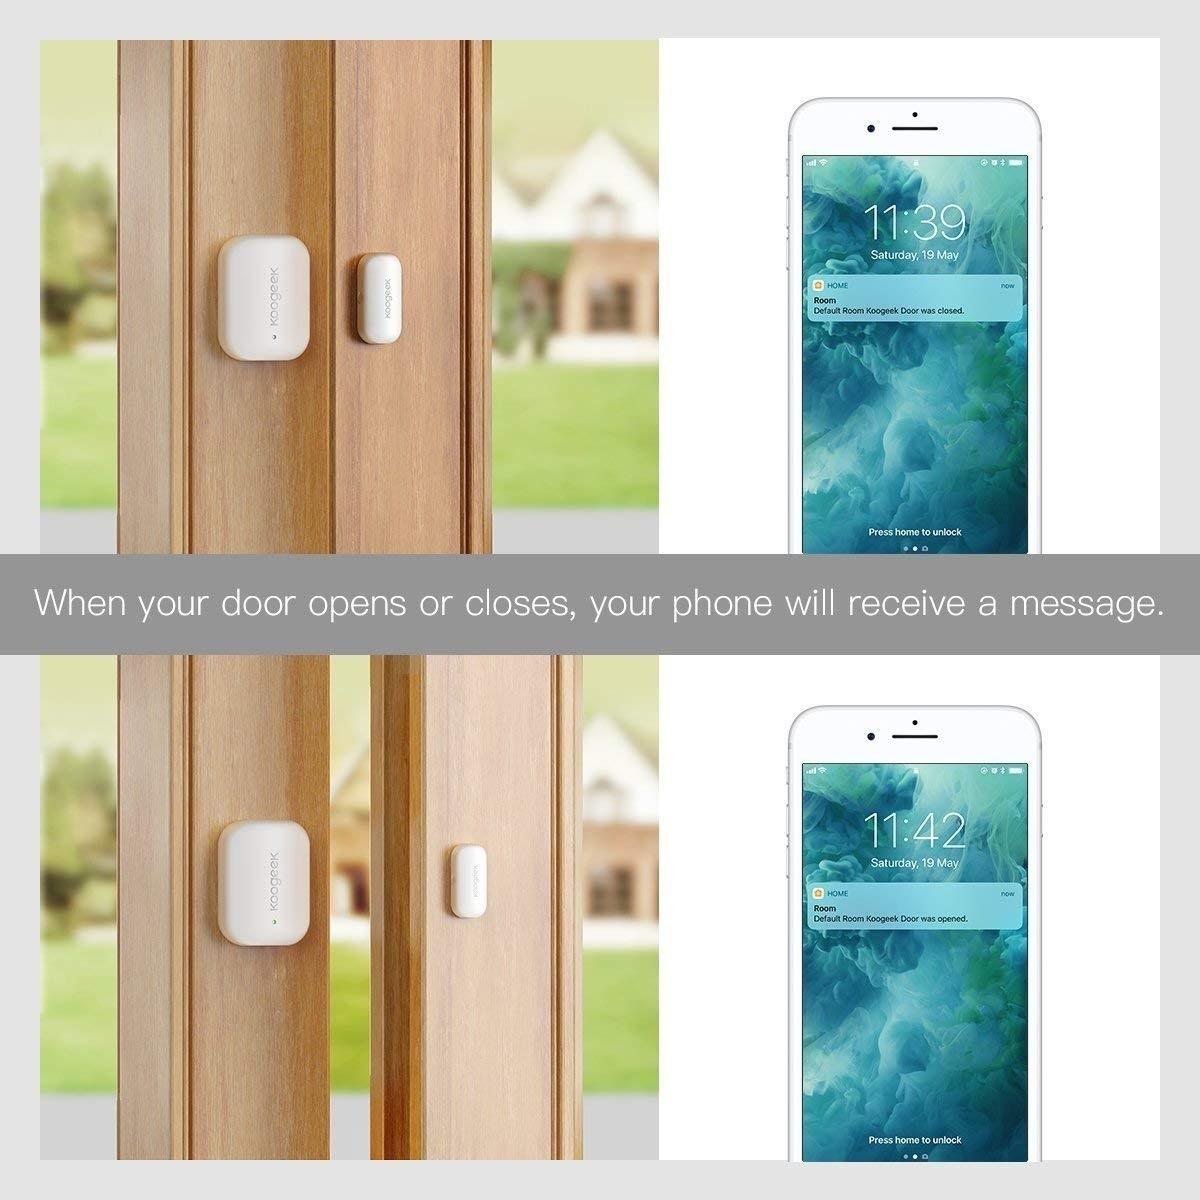 Sensor de puerta Koogeek como funciona